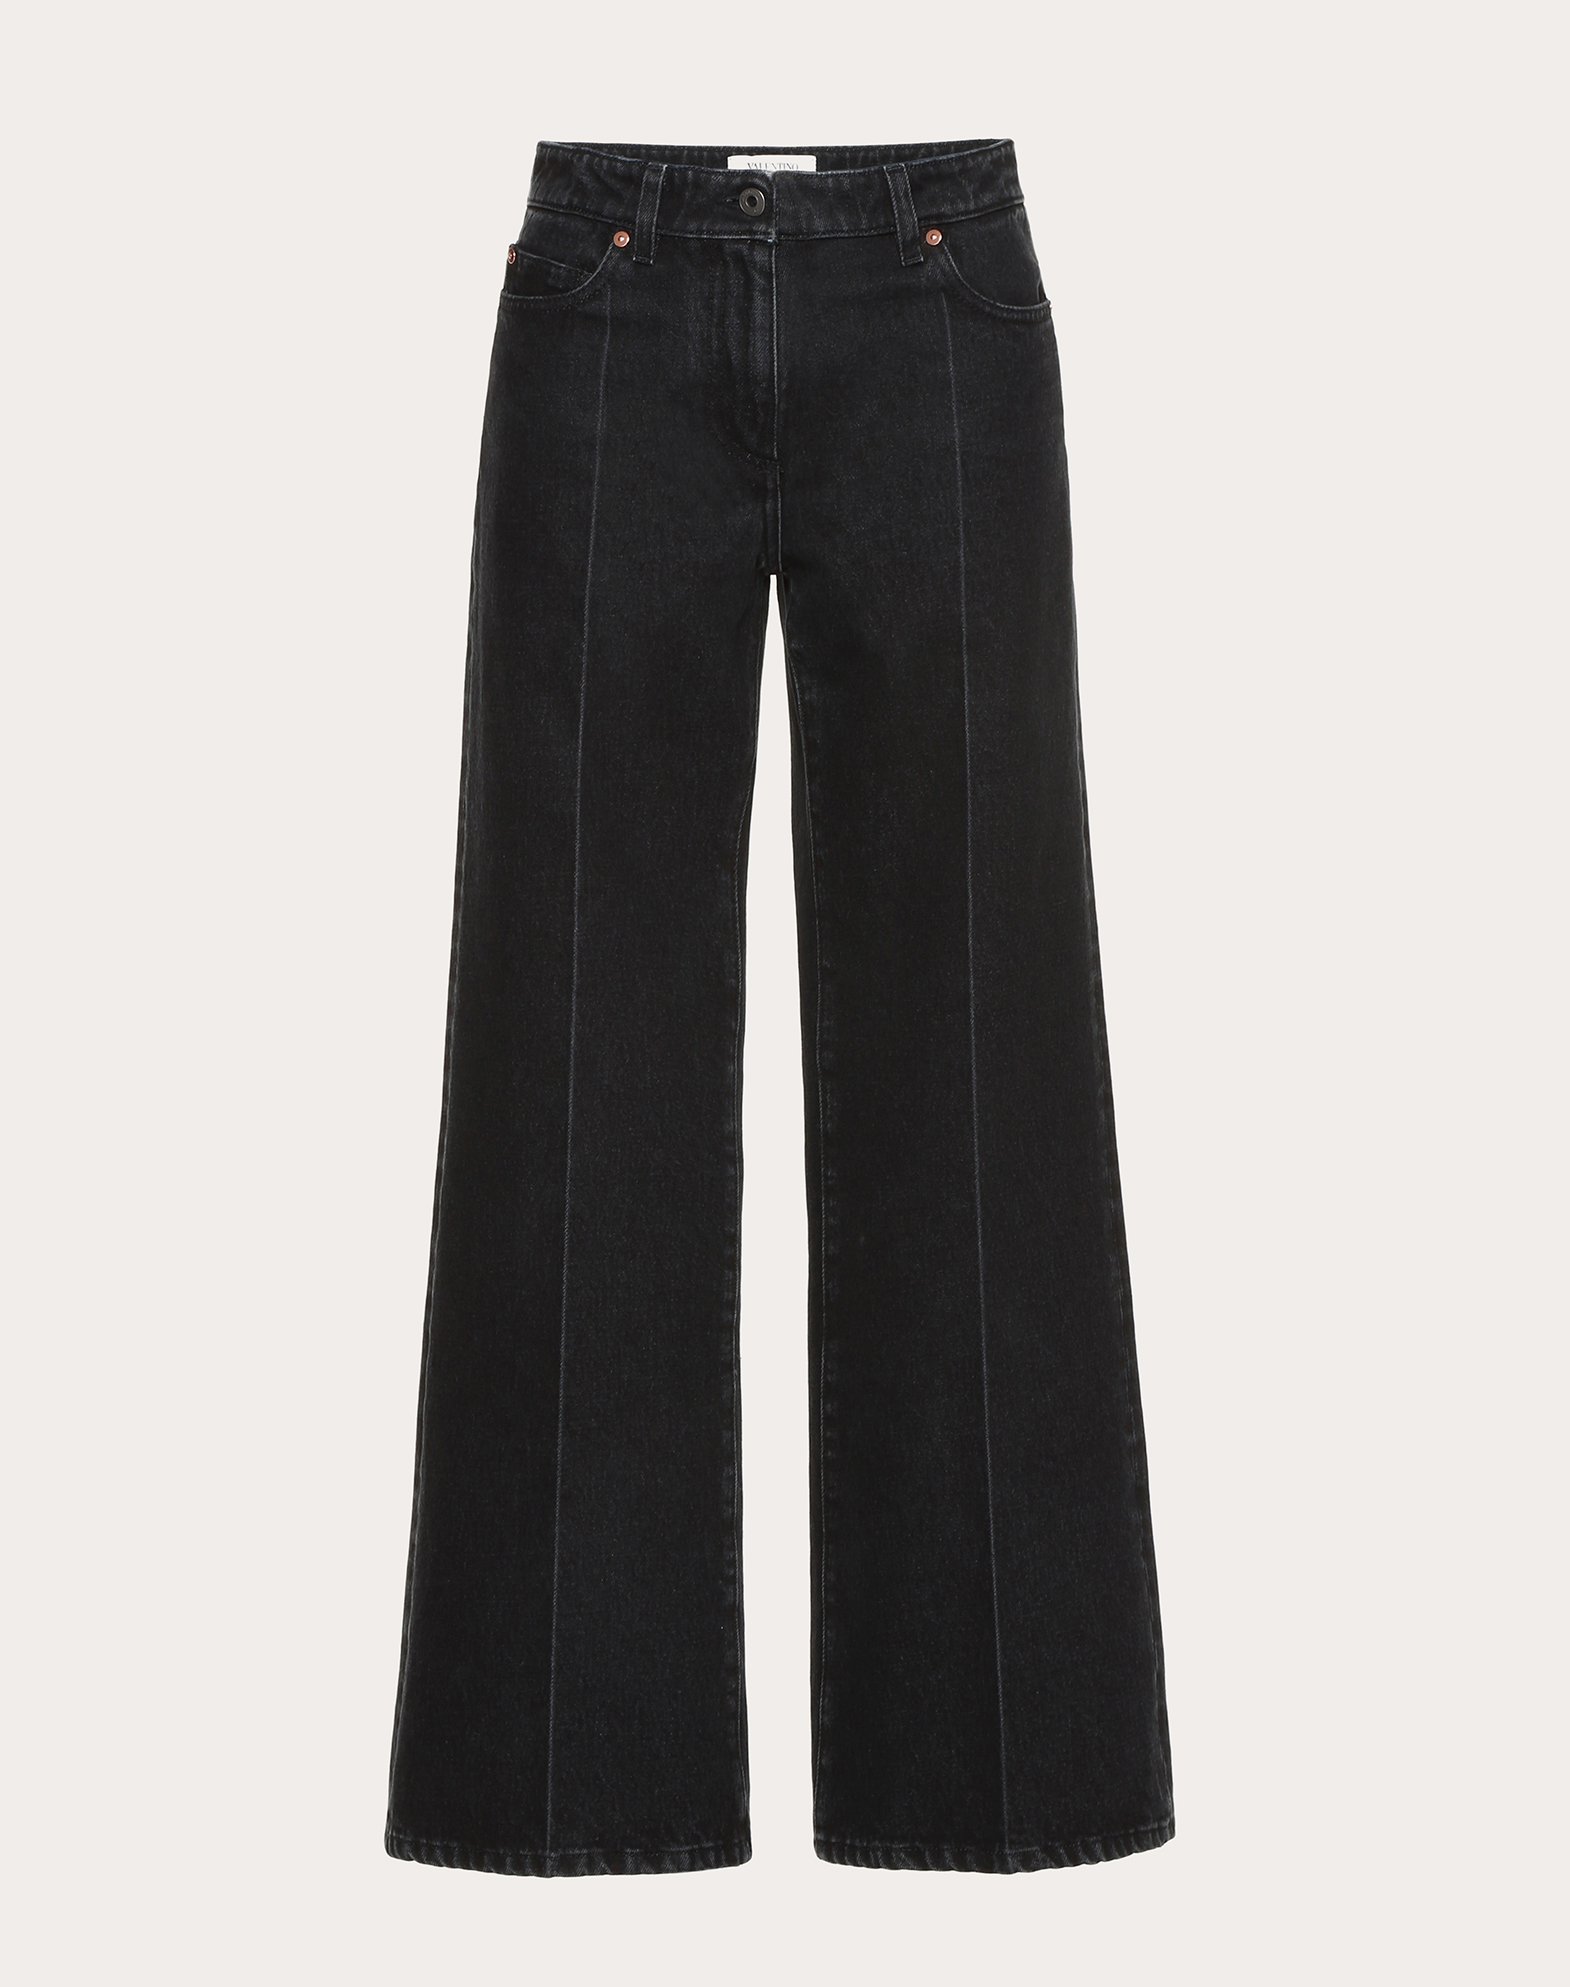 Deconstructed VLOGO Black Jeans